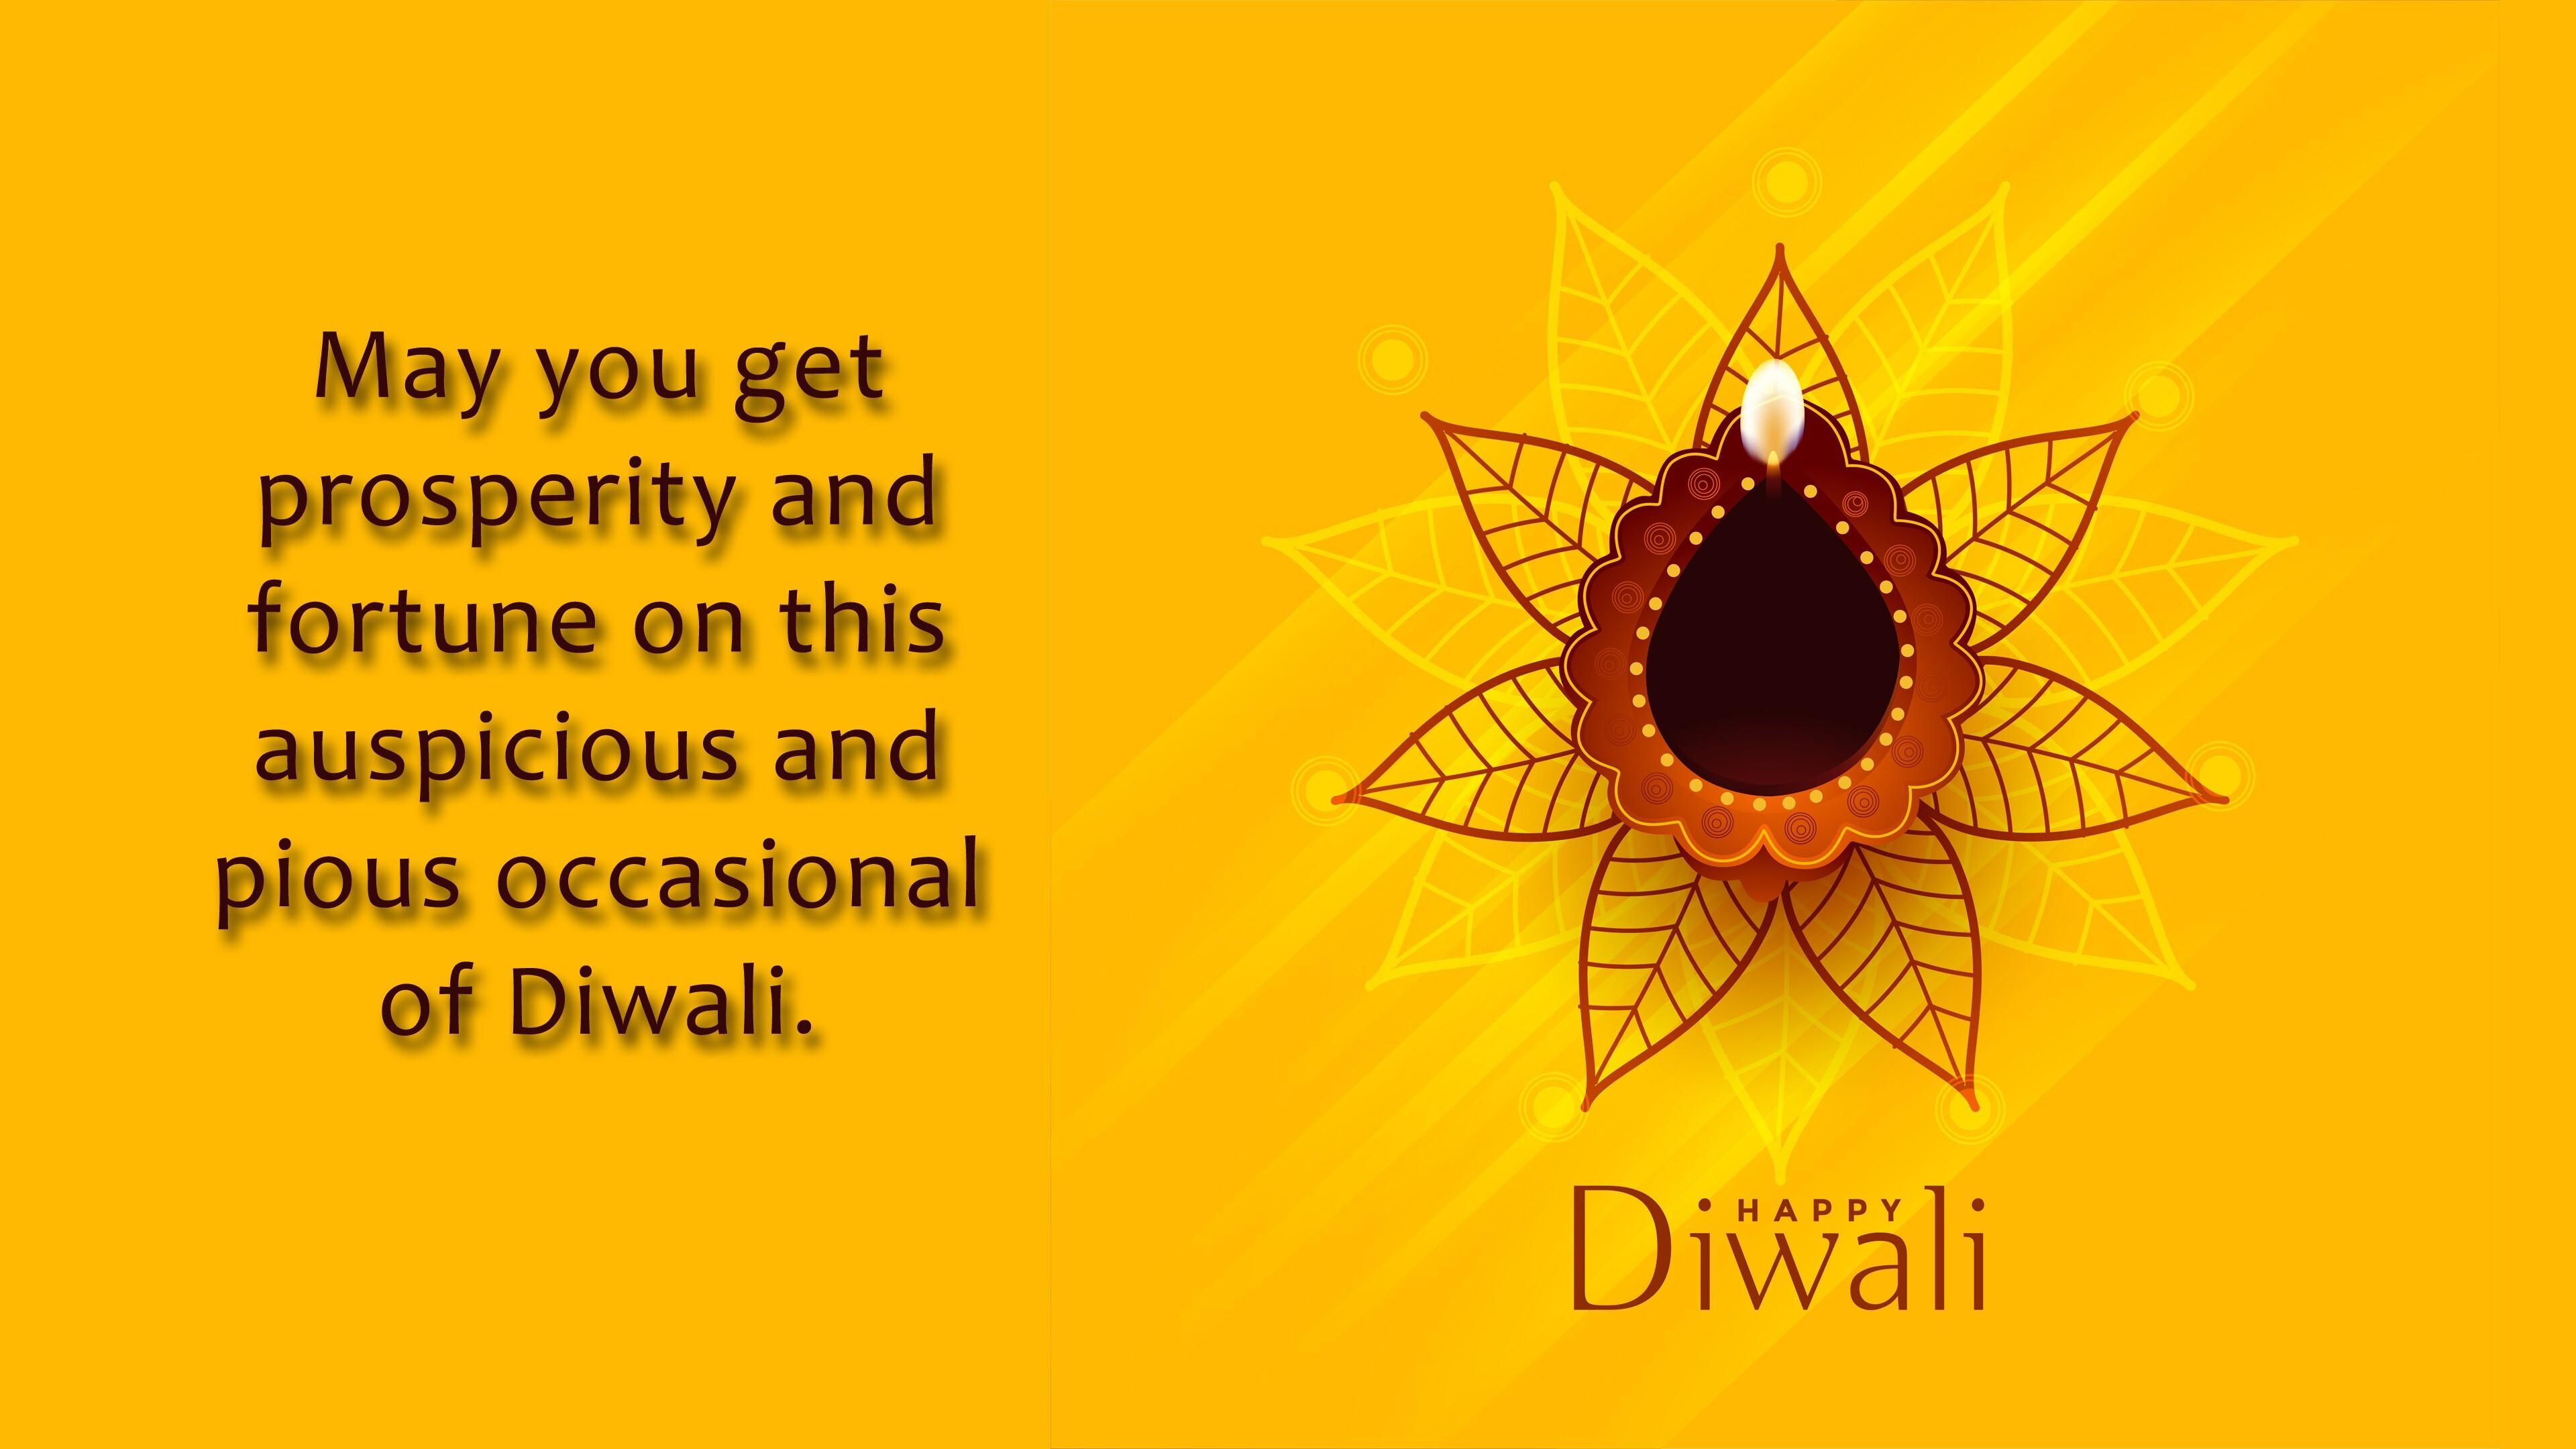 Happy Diwali Greeting Wish 4K Wallpaper